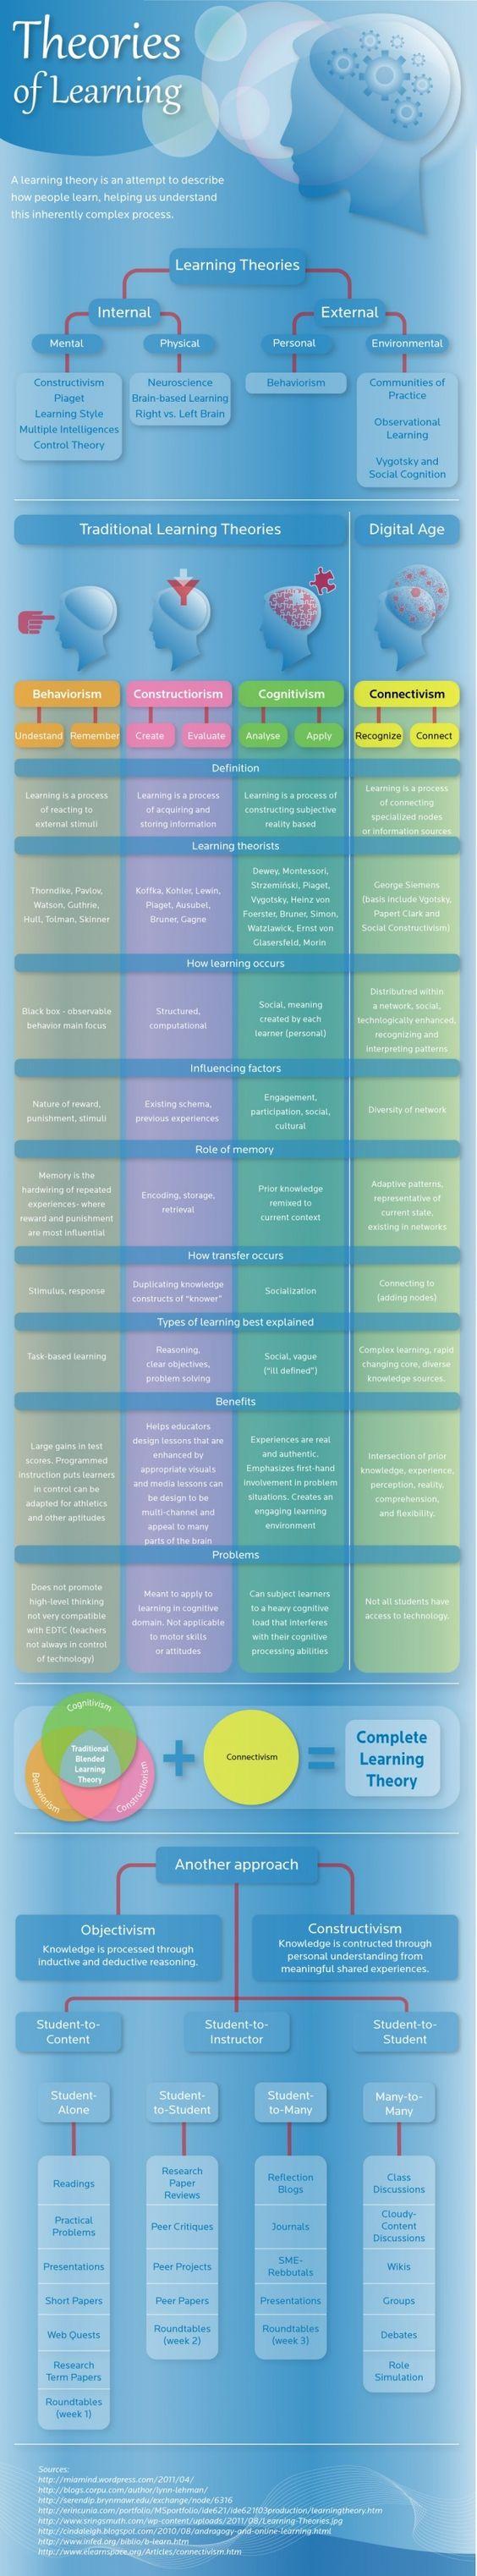 Estilos de aprendizaje y teorías #infografia #infographic#education